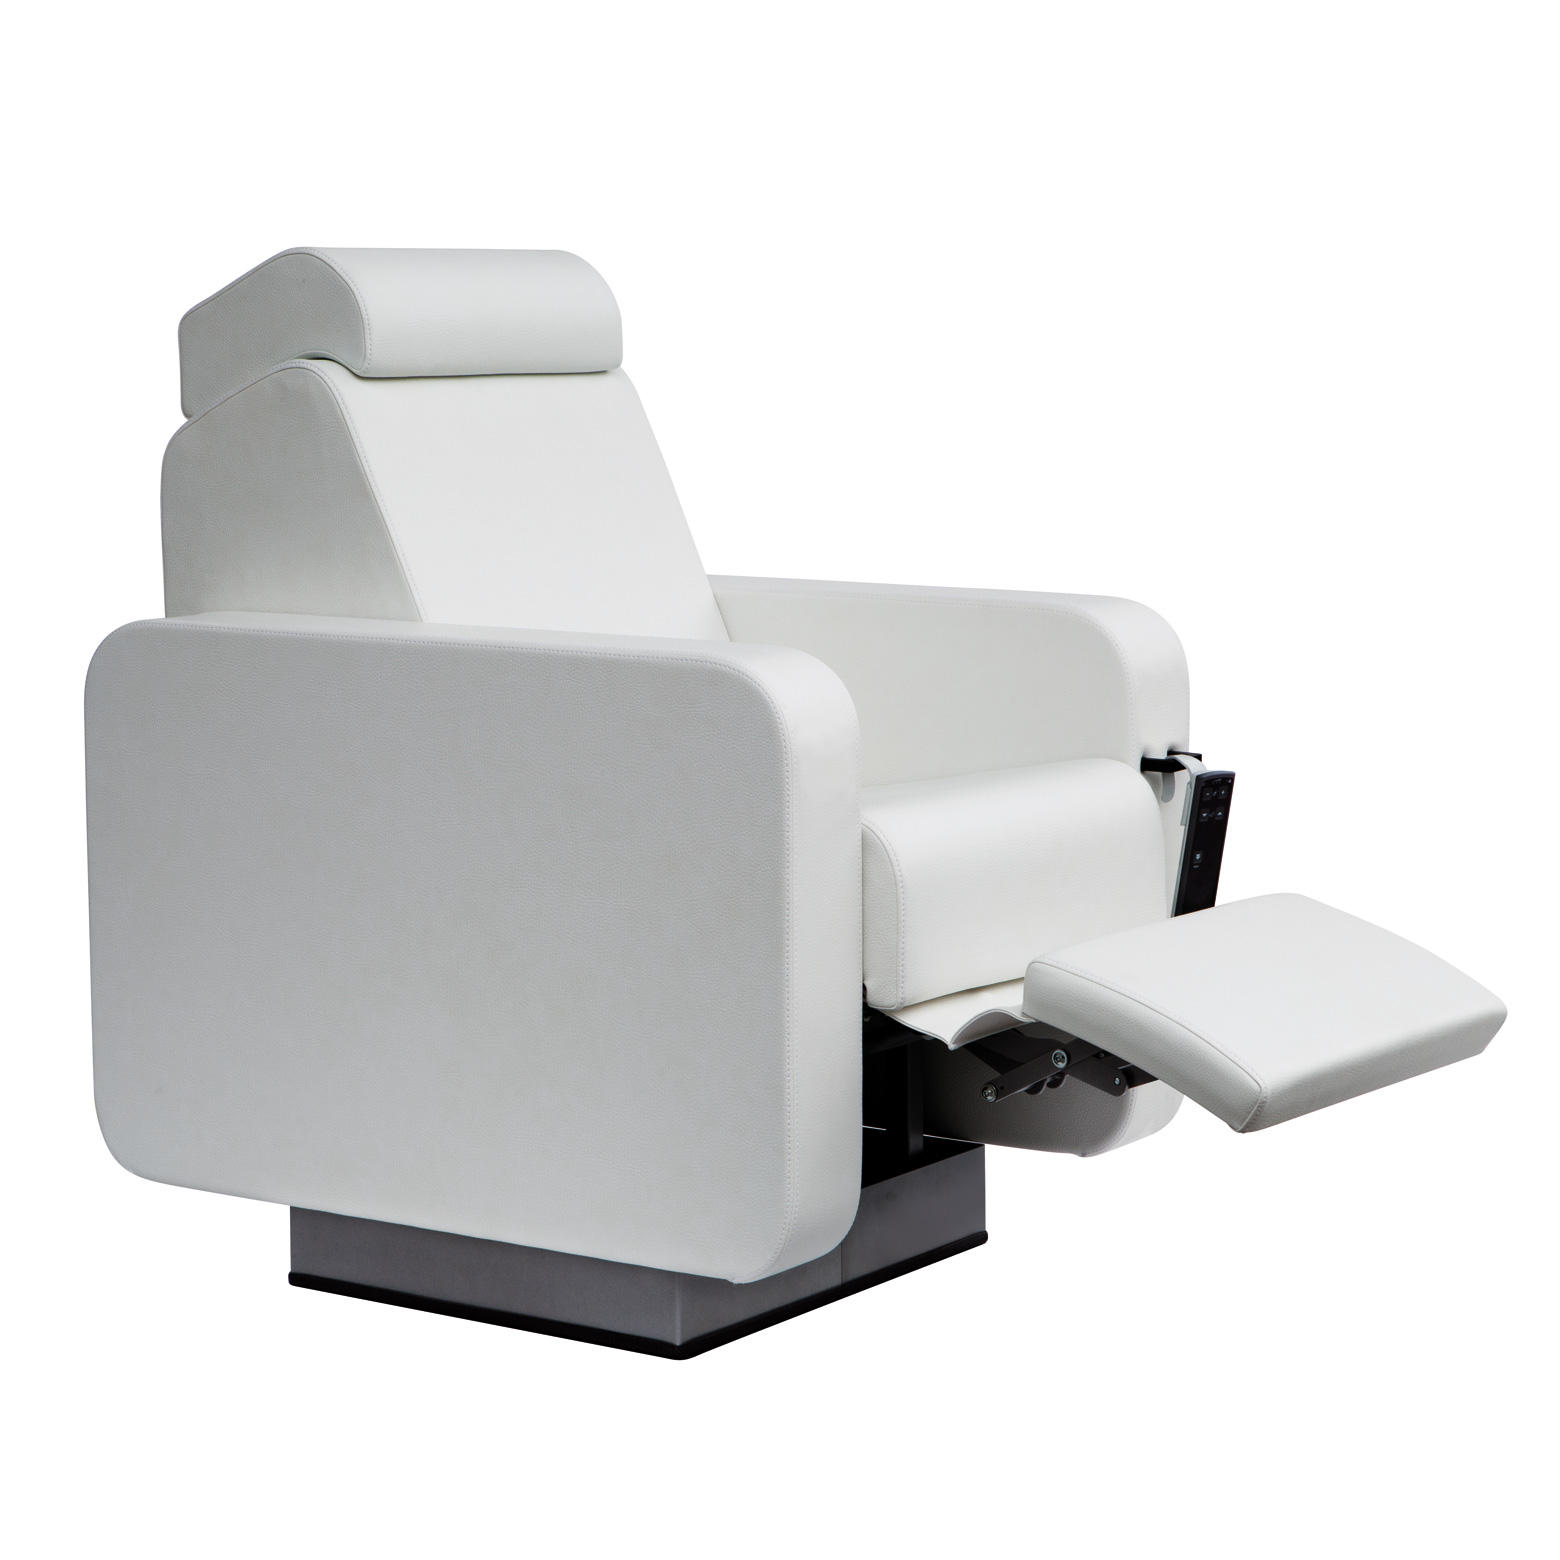 Spa Chair Cosmolore 187 For Pedicure And Manicure